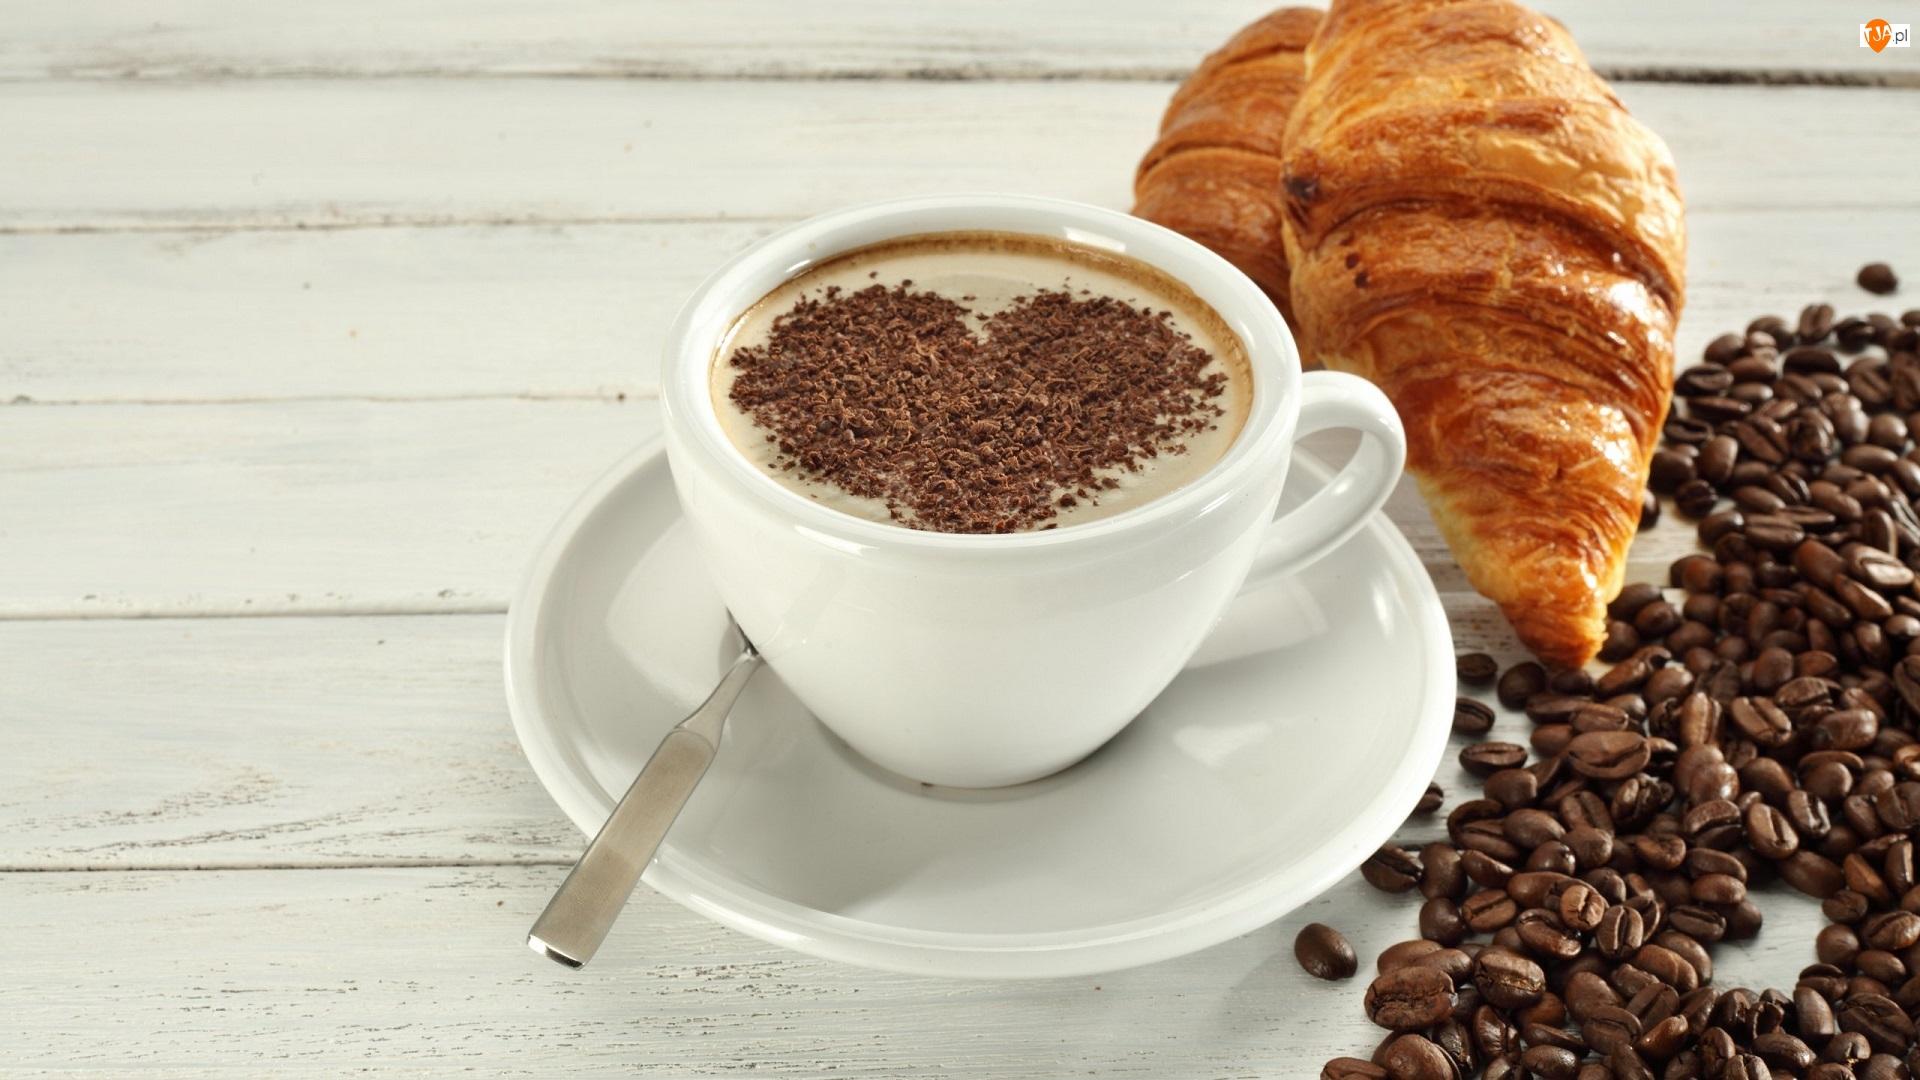 Kawa, Filiżanka, Ziarna, Croissanty, Serce, Rogaliki